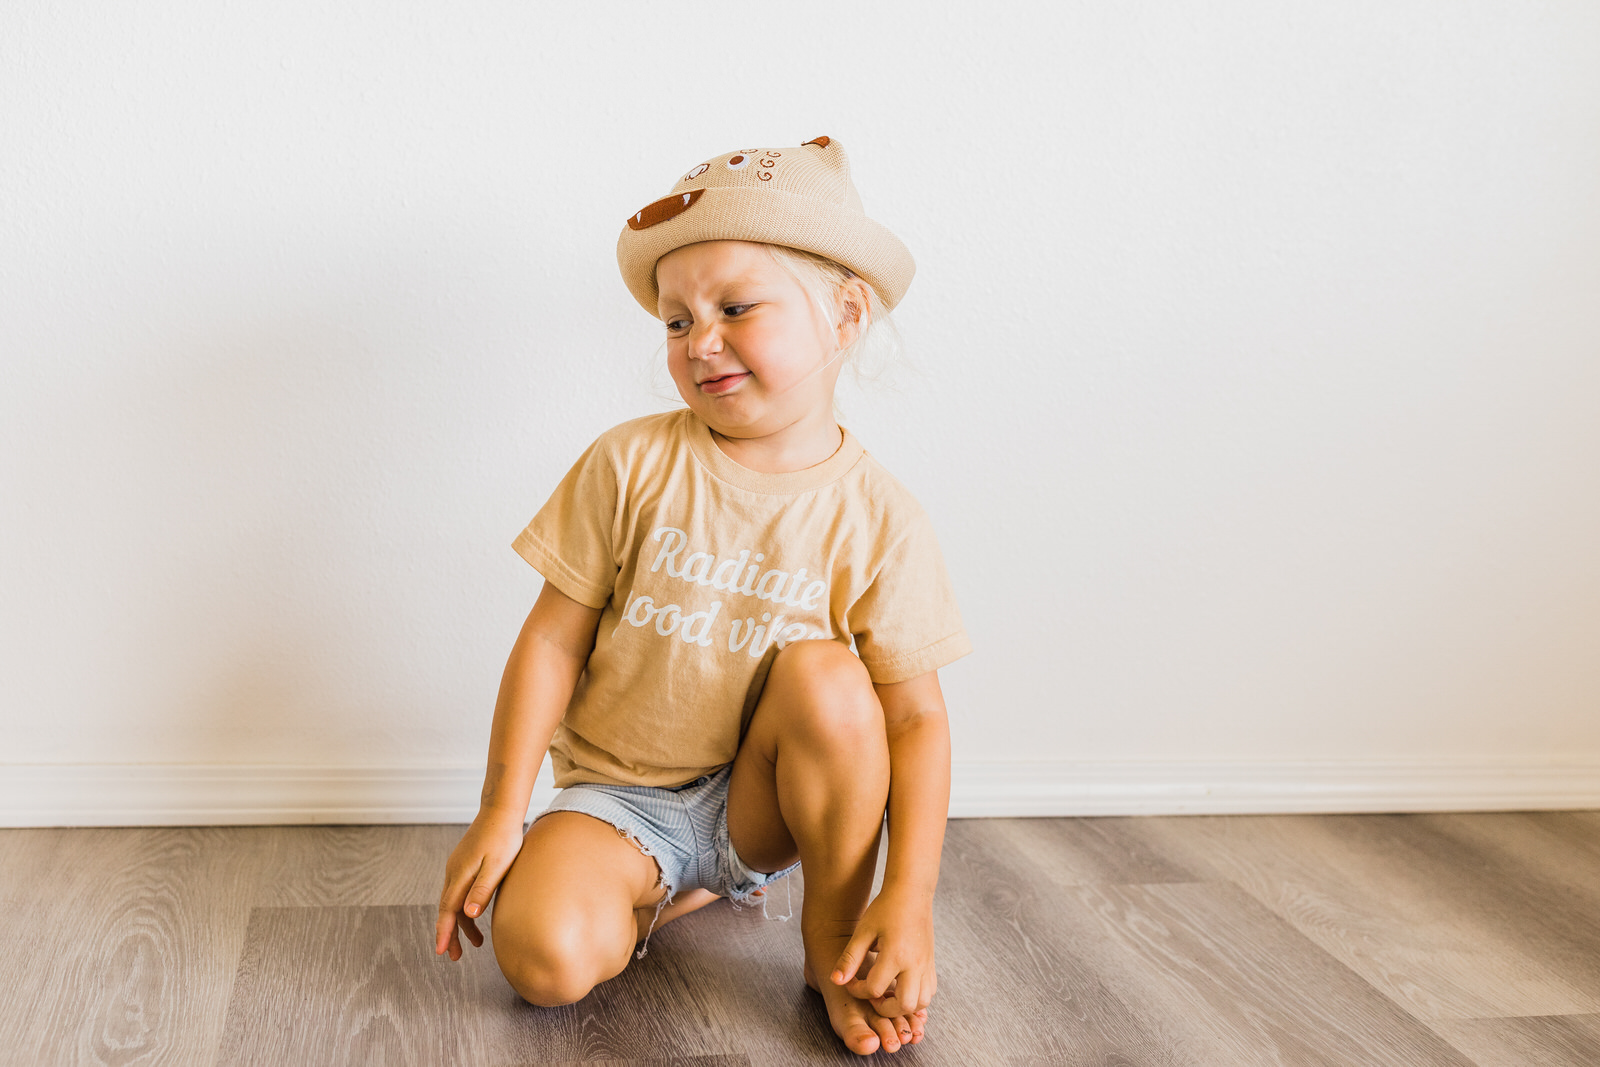 kids-clothes-small-business-collaboration-women-hawaii-7770.jpg